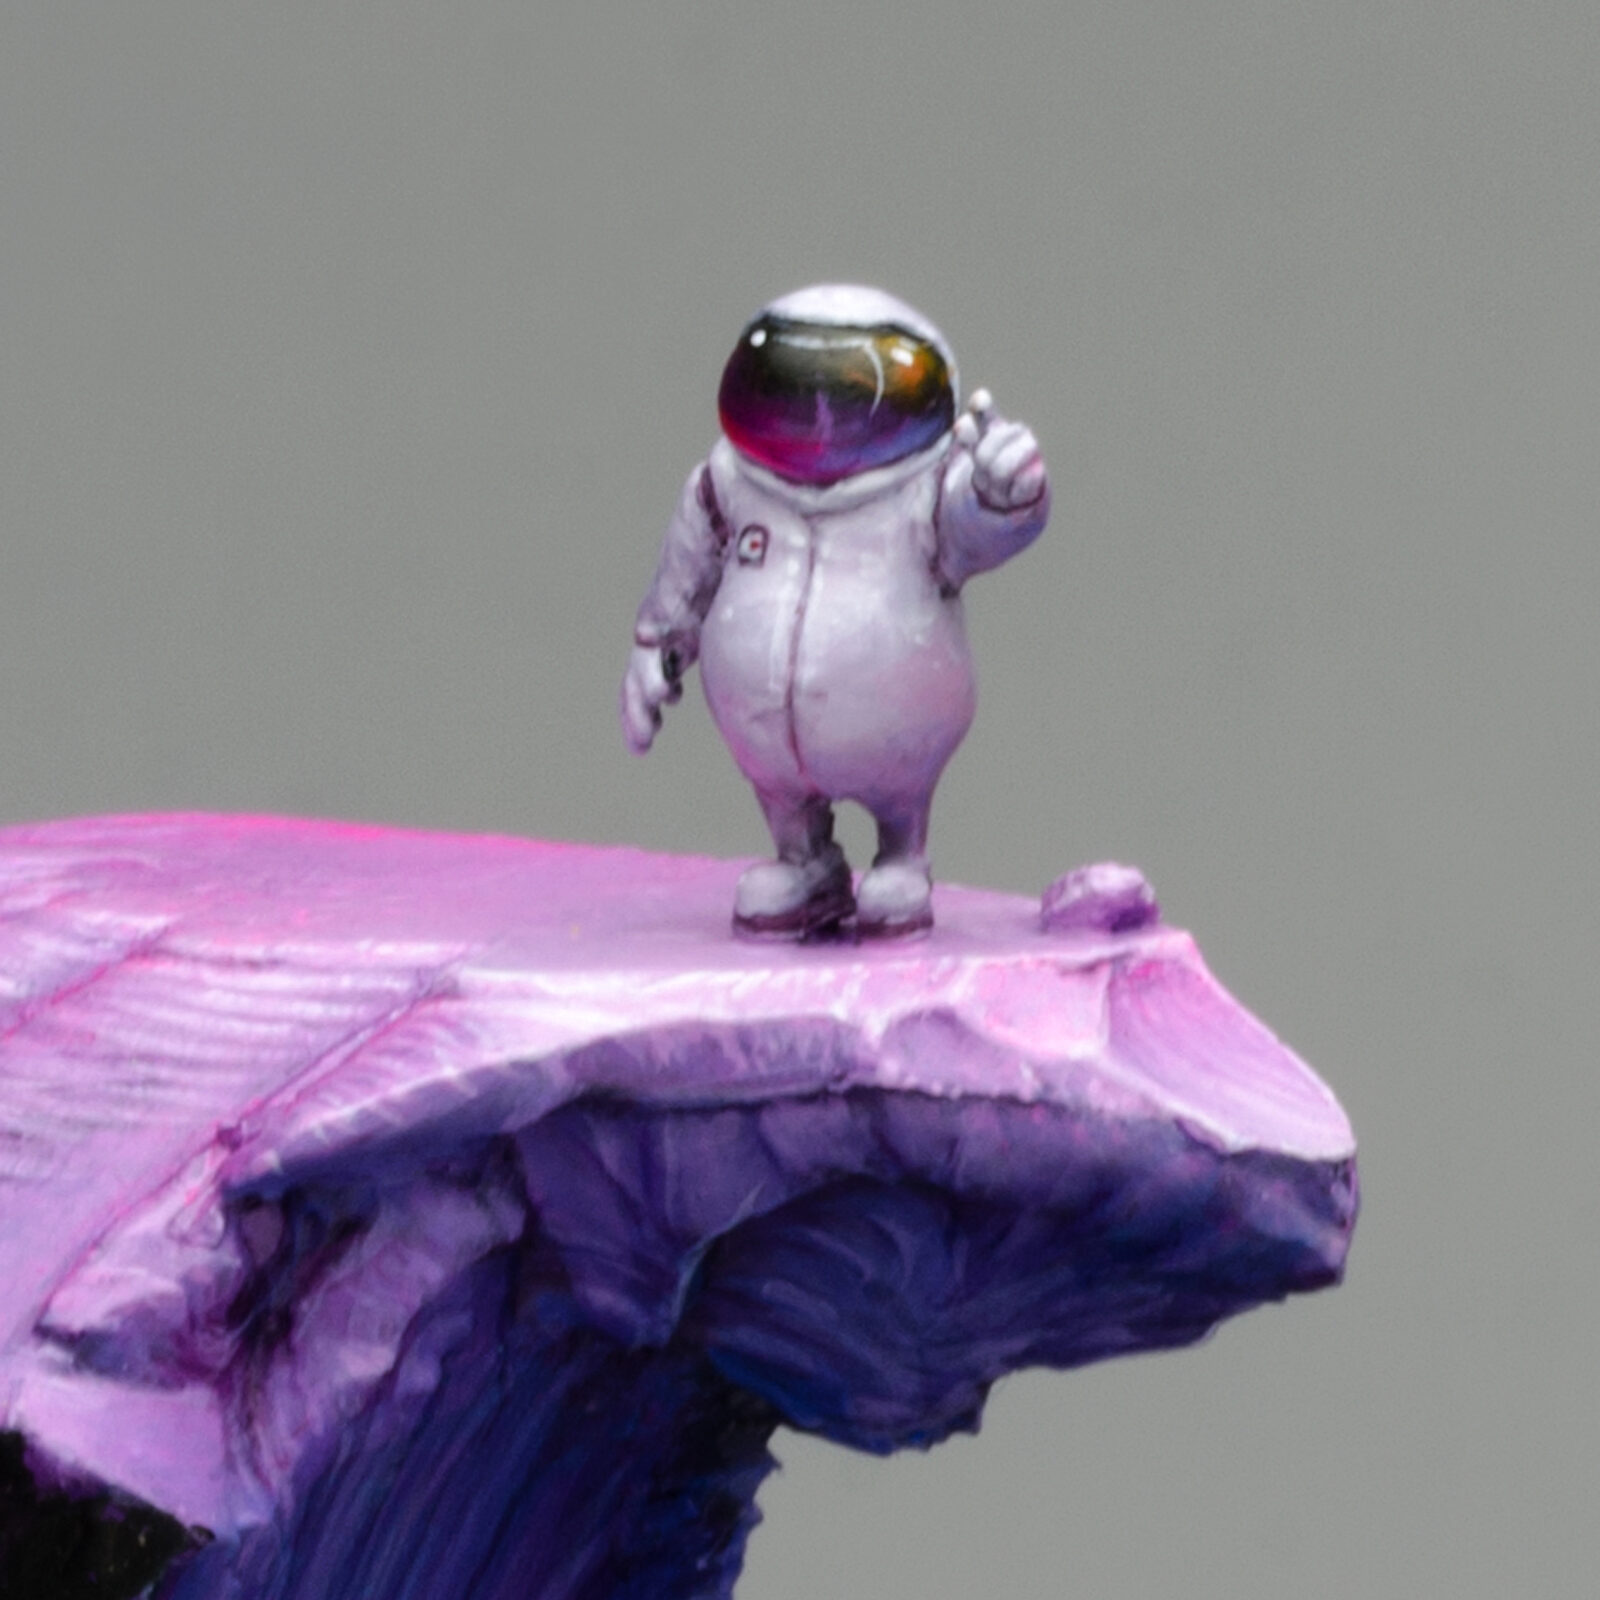 Astronaut03